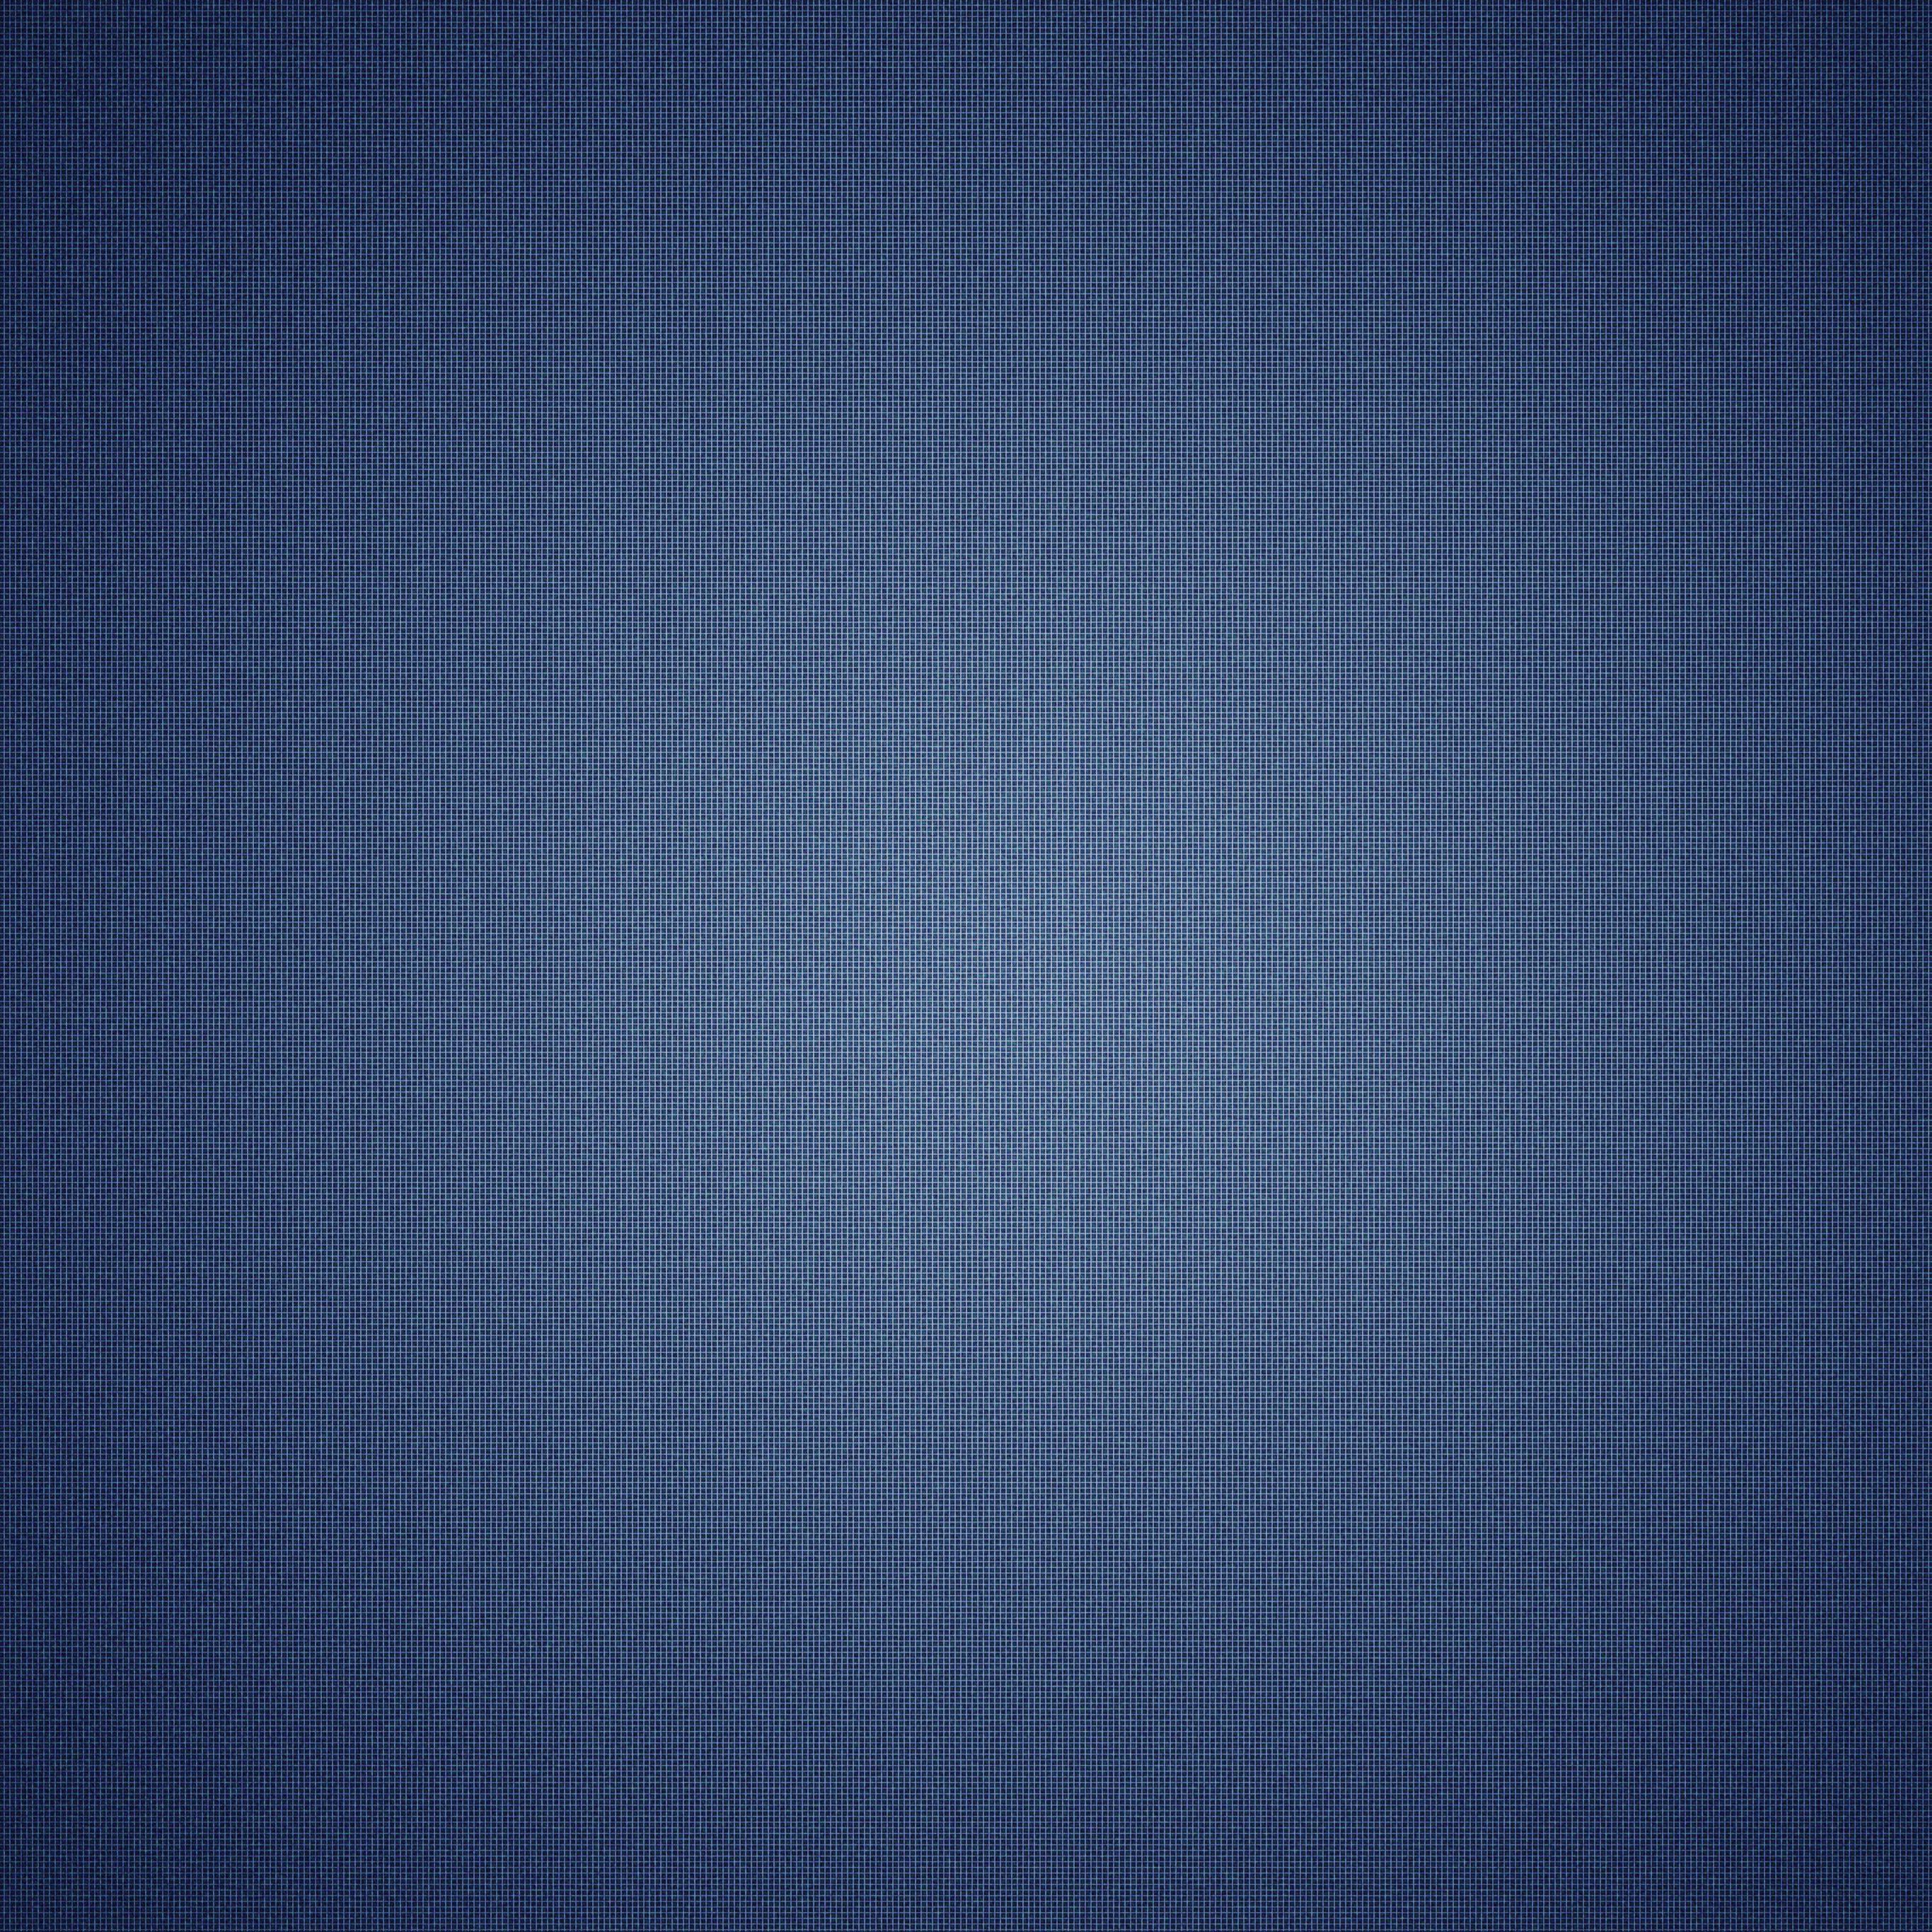 Blue Gradient 05 Ipad Pro Wallpaper